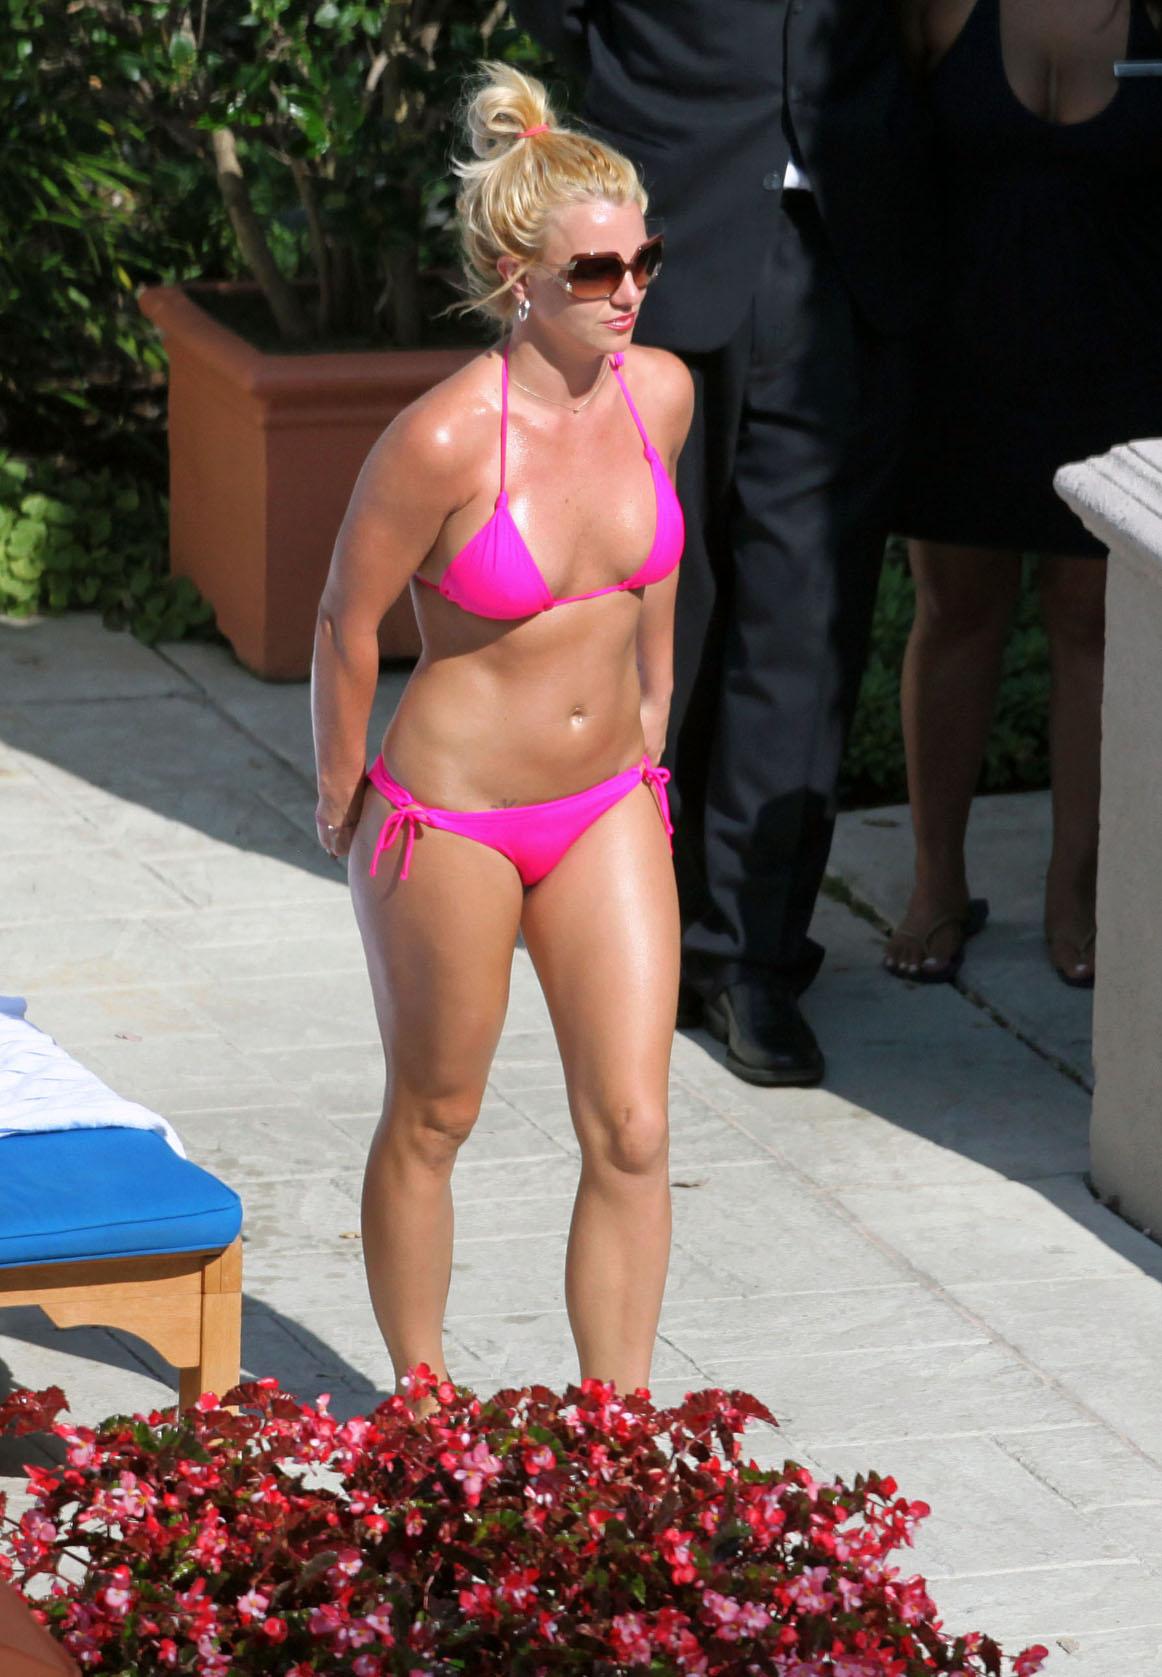 Bikini britney pic spear